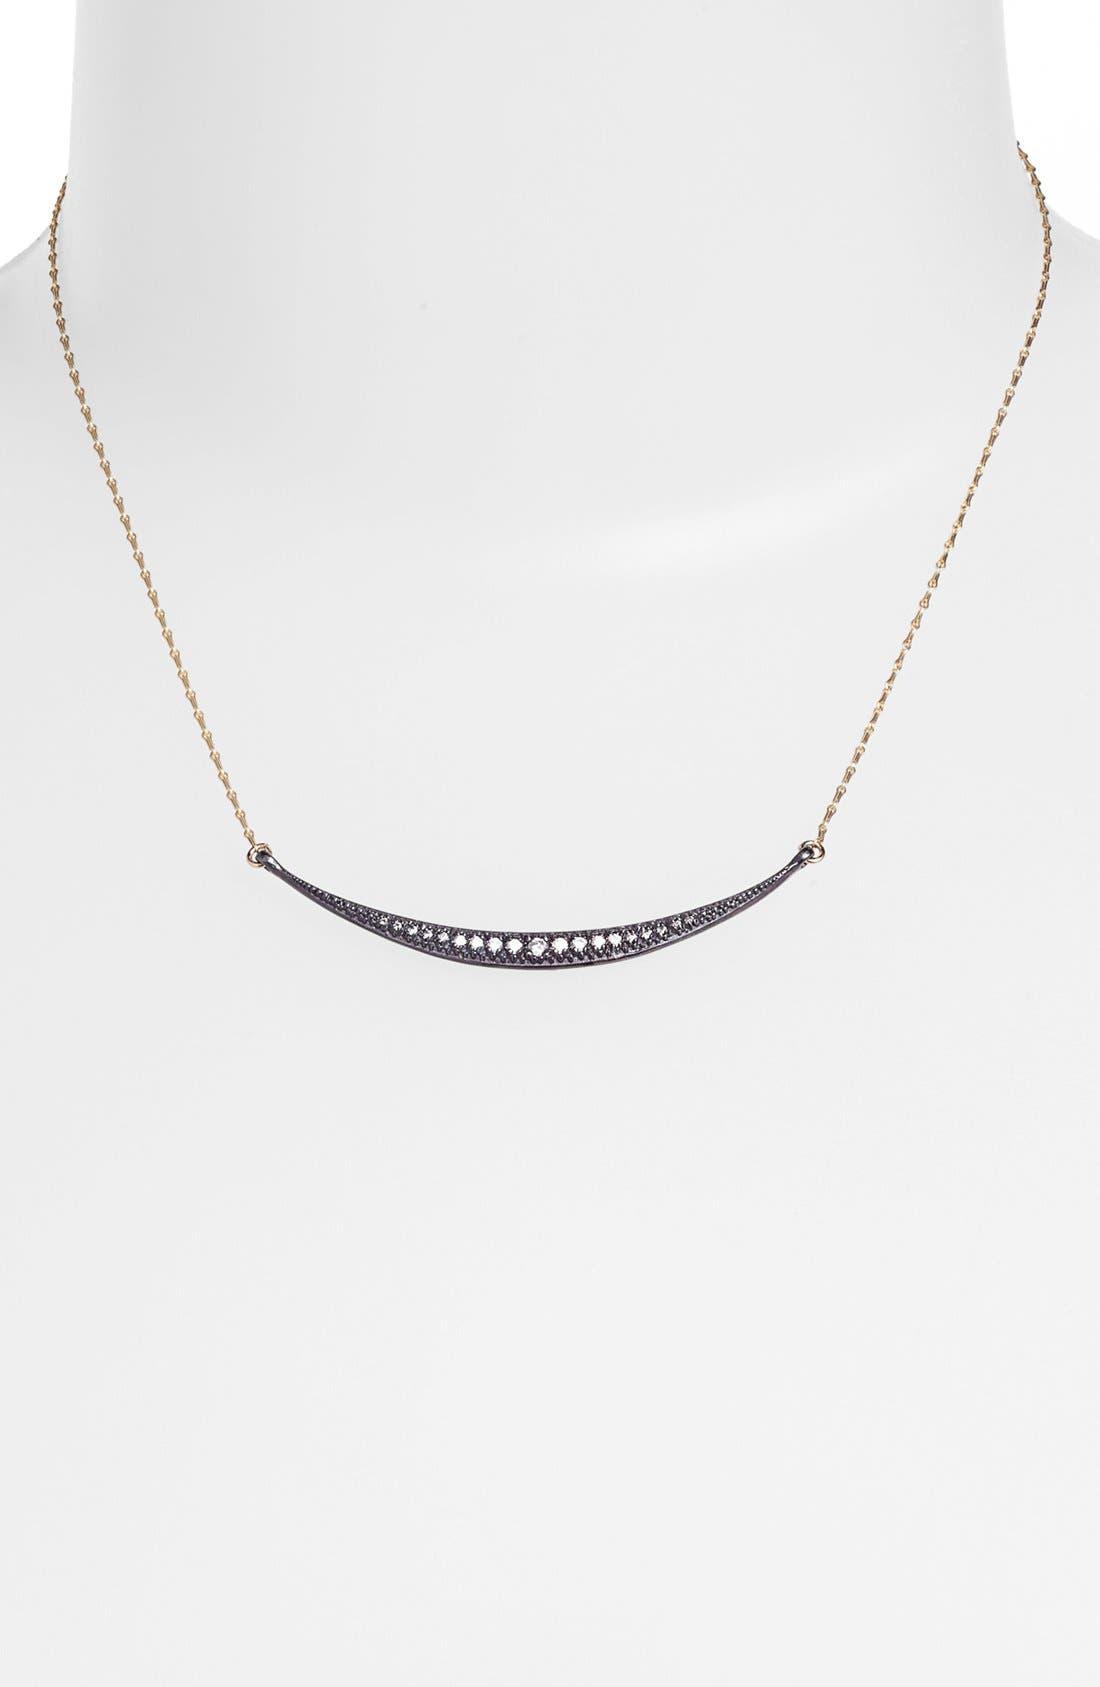 Alternate Image 1 Selected - Mizuki 'Icicles' Diamond Crescent Pendant Necklace